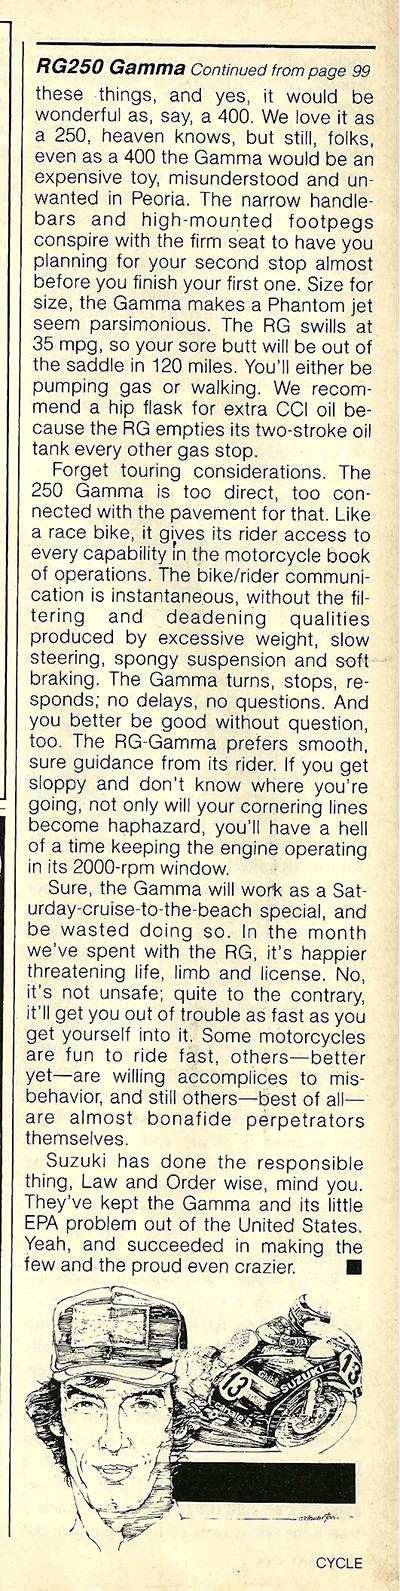 1984 Suzuki RG250 Gamma road test 9.jpg